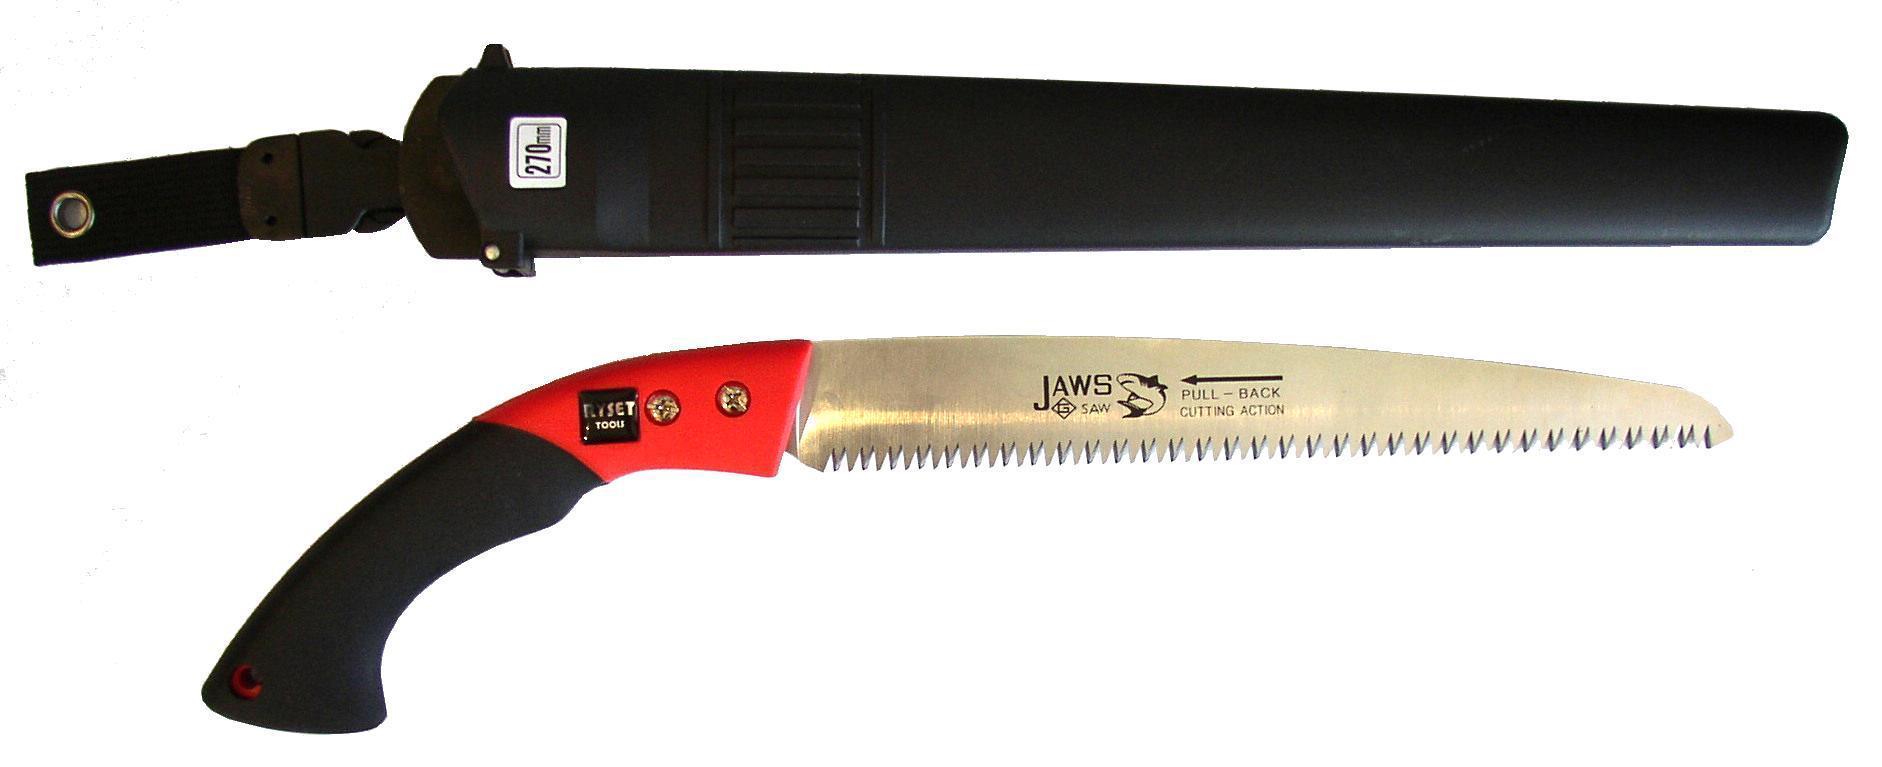 GD212-jaws-straight-saw.jpg